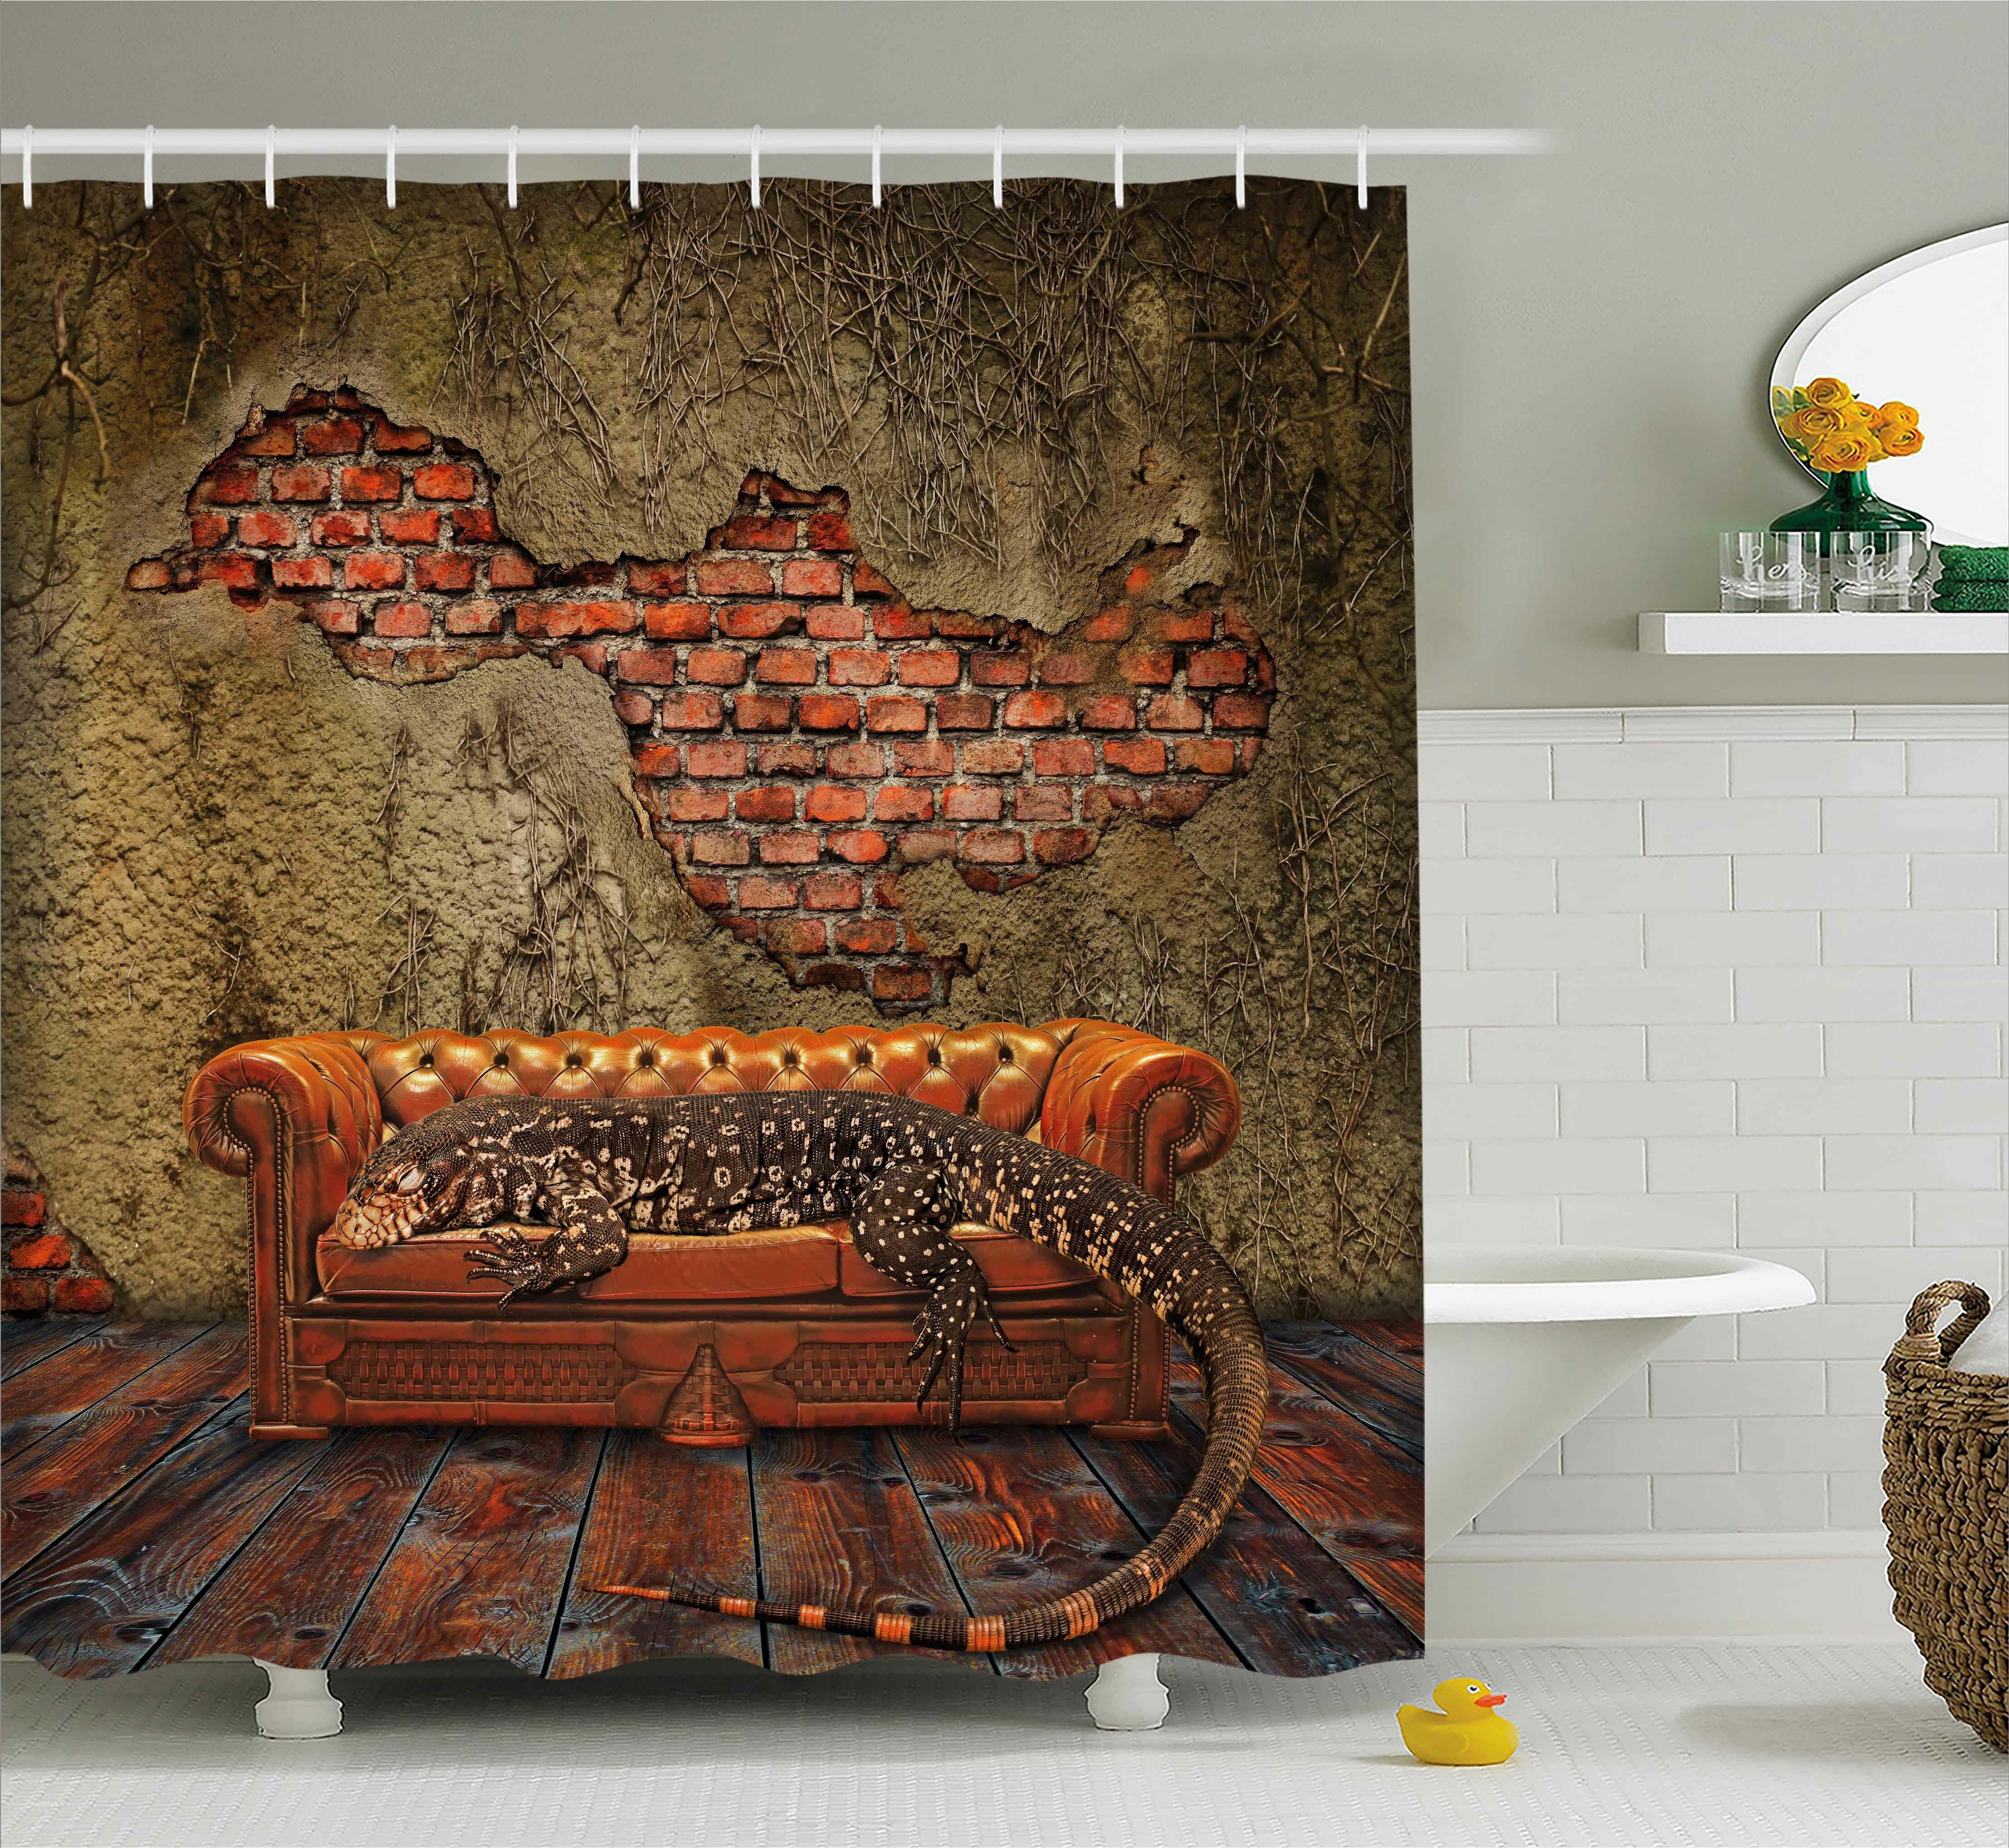 East Urban Home Fantasy Grunge Brick Wall Shower Curtain